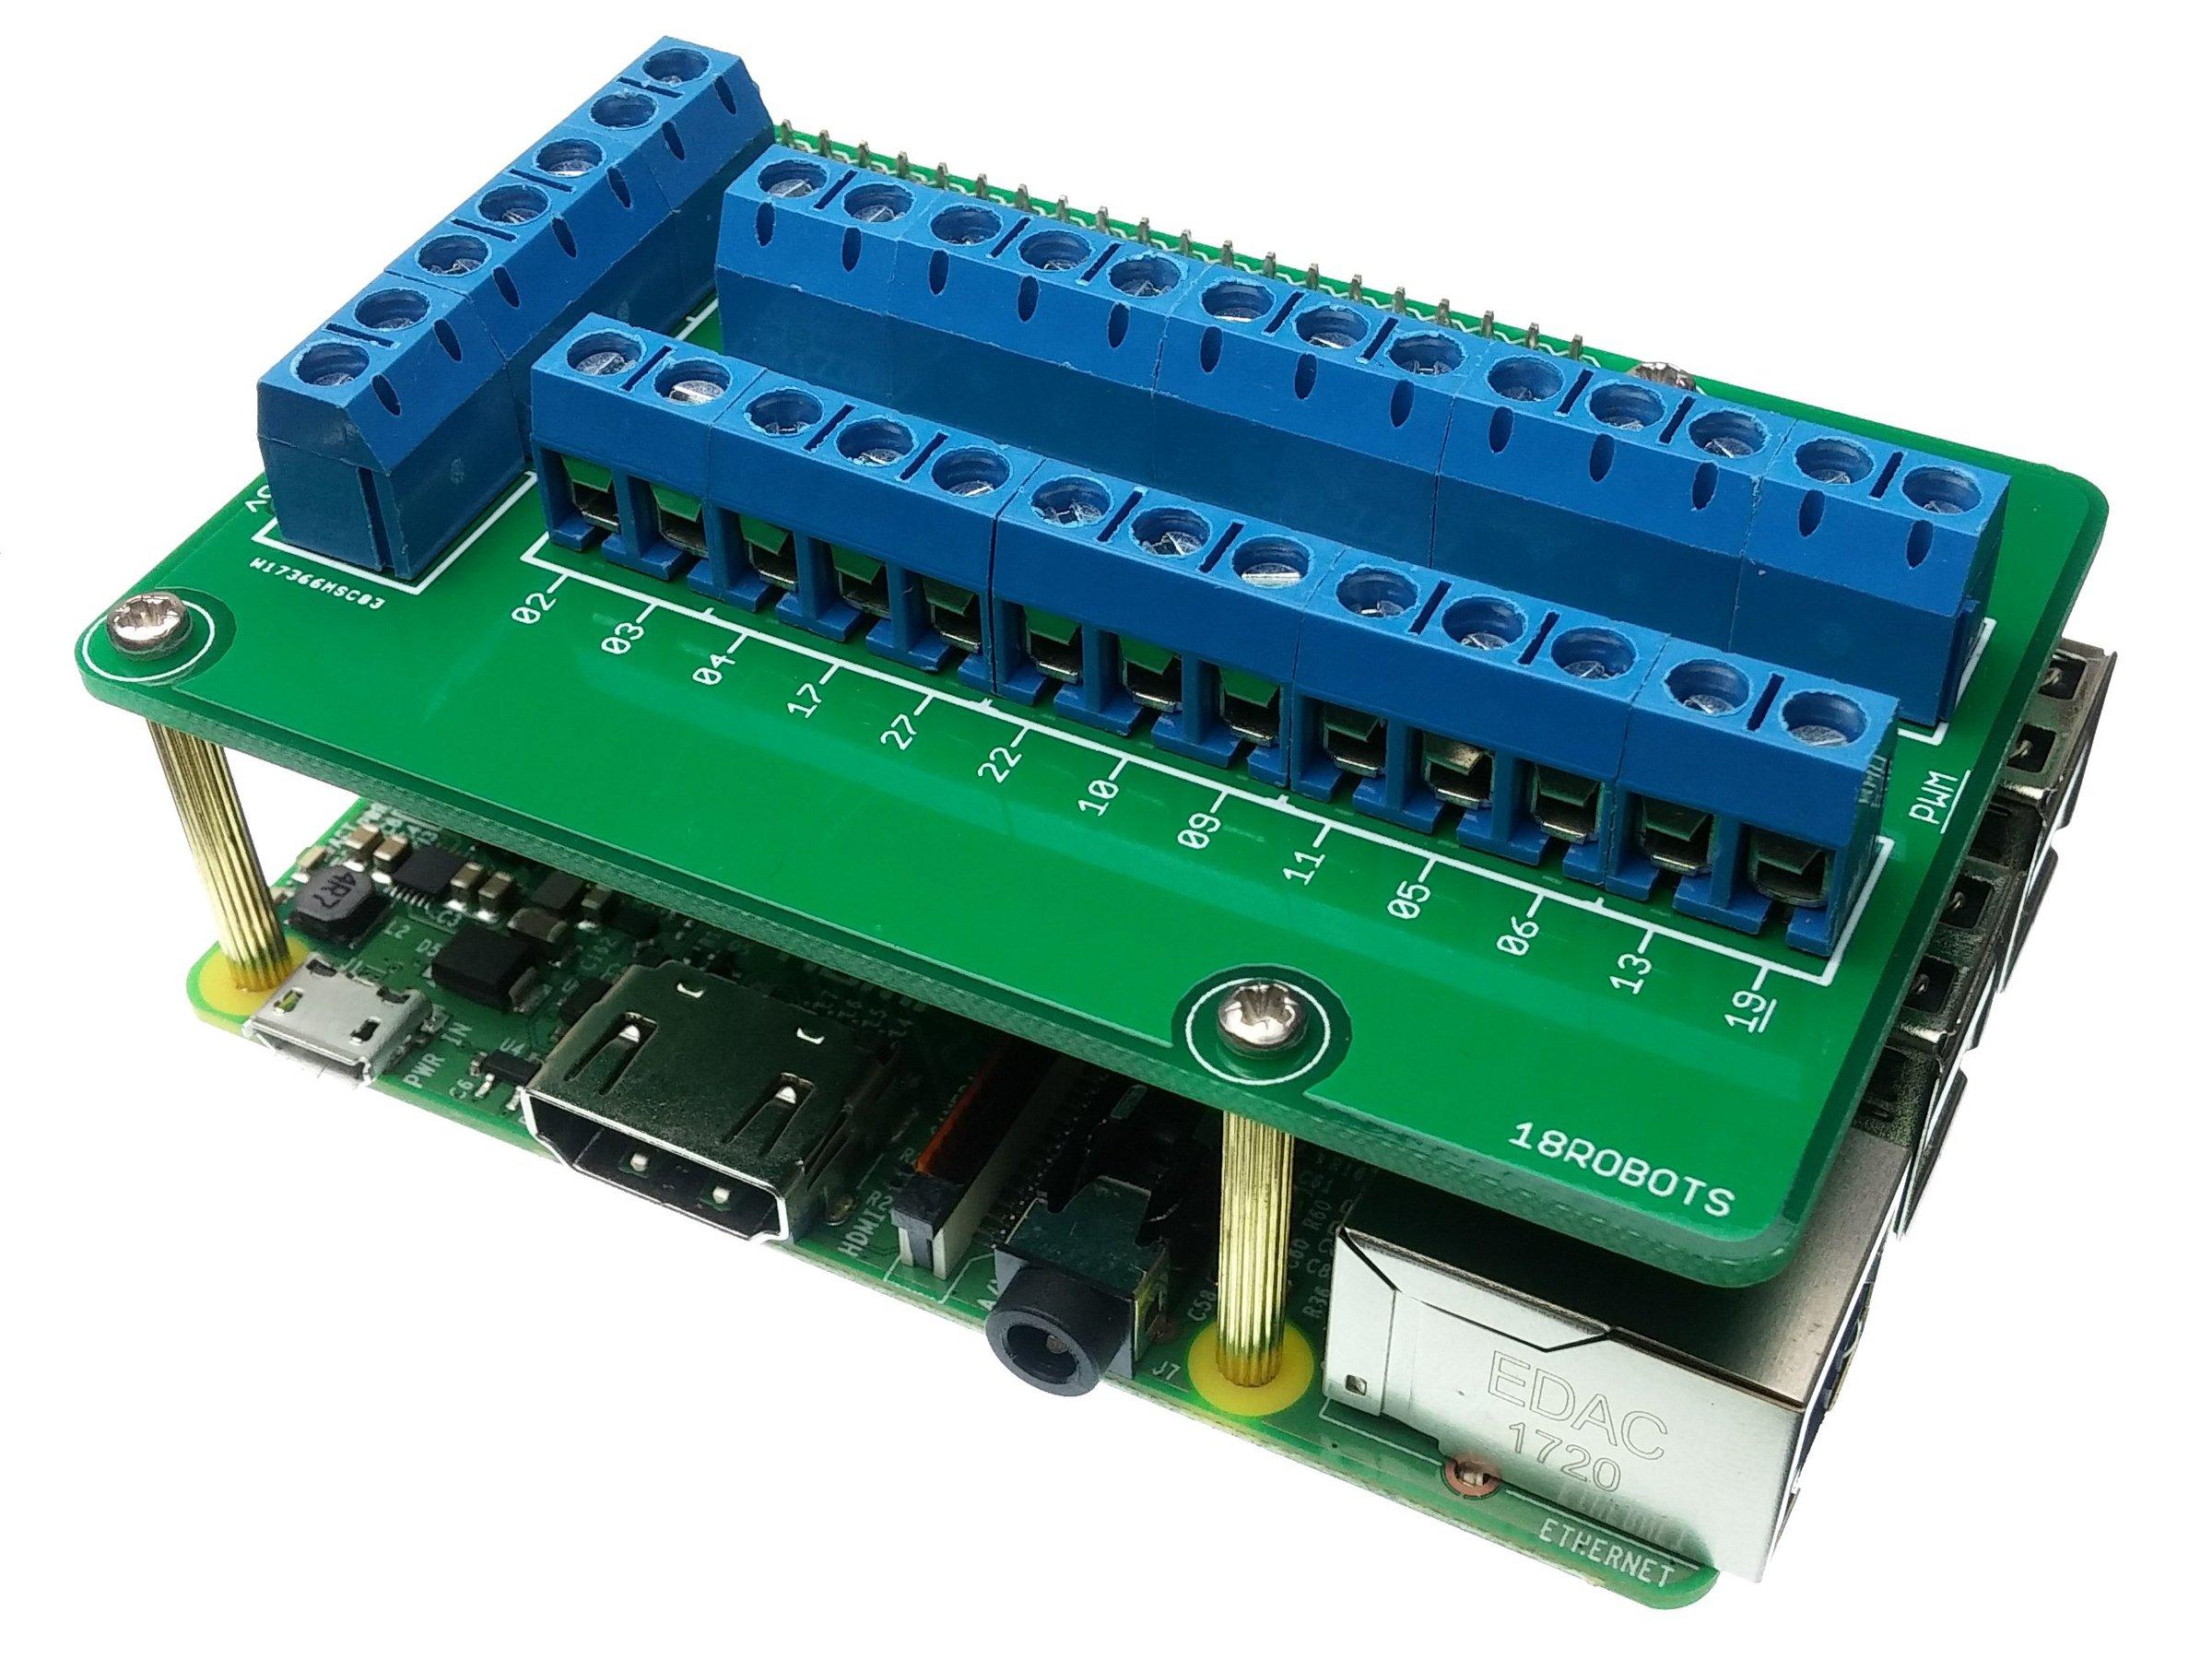 10w High Power Rgb Led Module With Heatsink Fan From 18robots On Adjustable Driver Sale Raspberry Pi Screw Terminal Shield V2